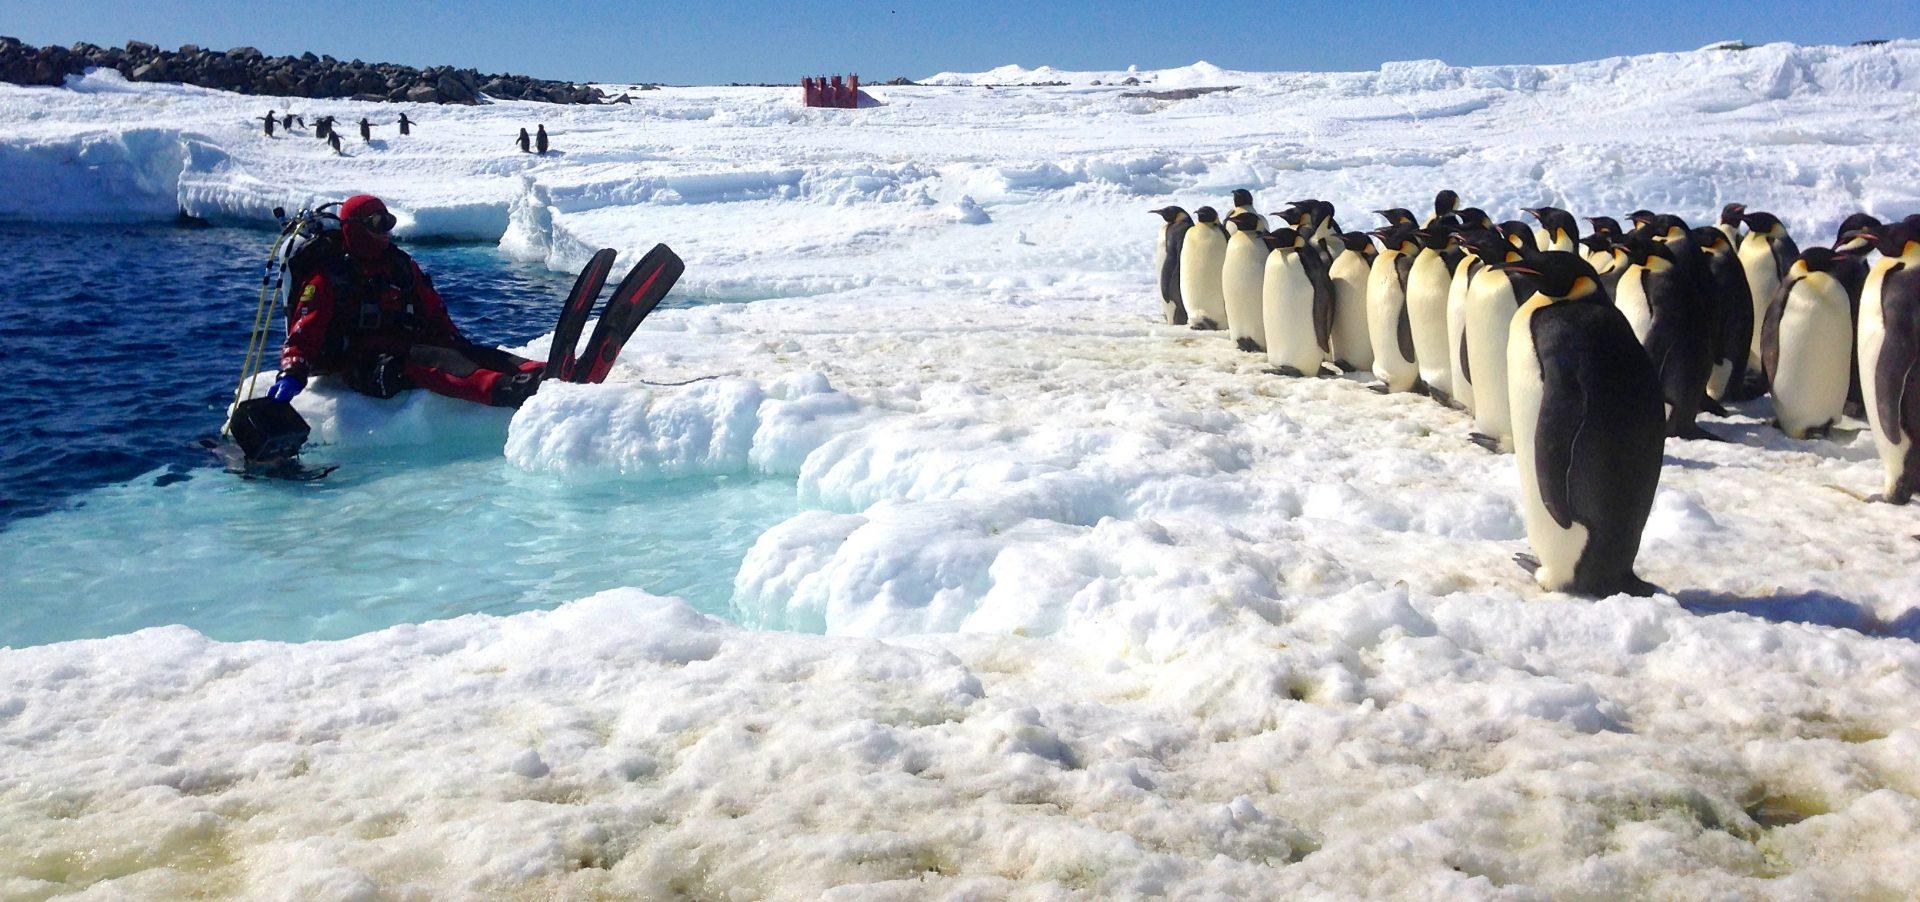 Antarktis 4K